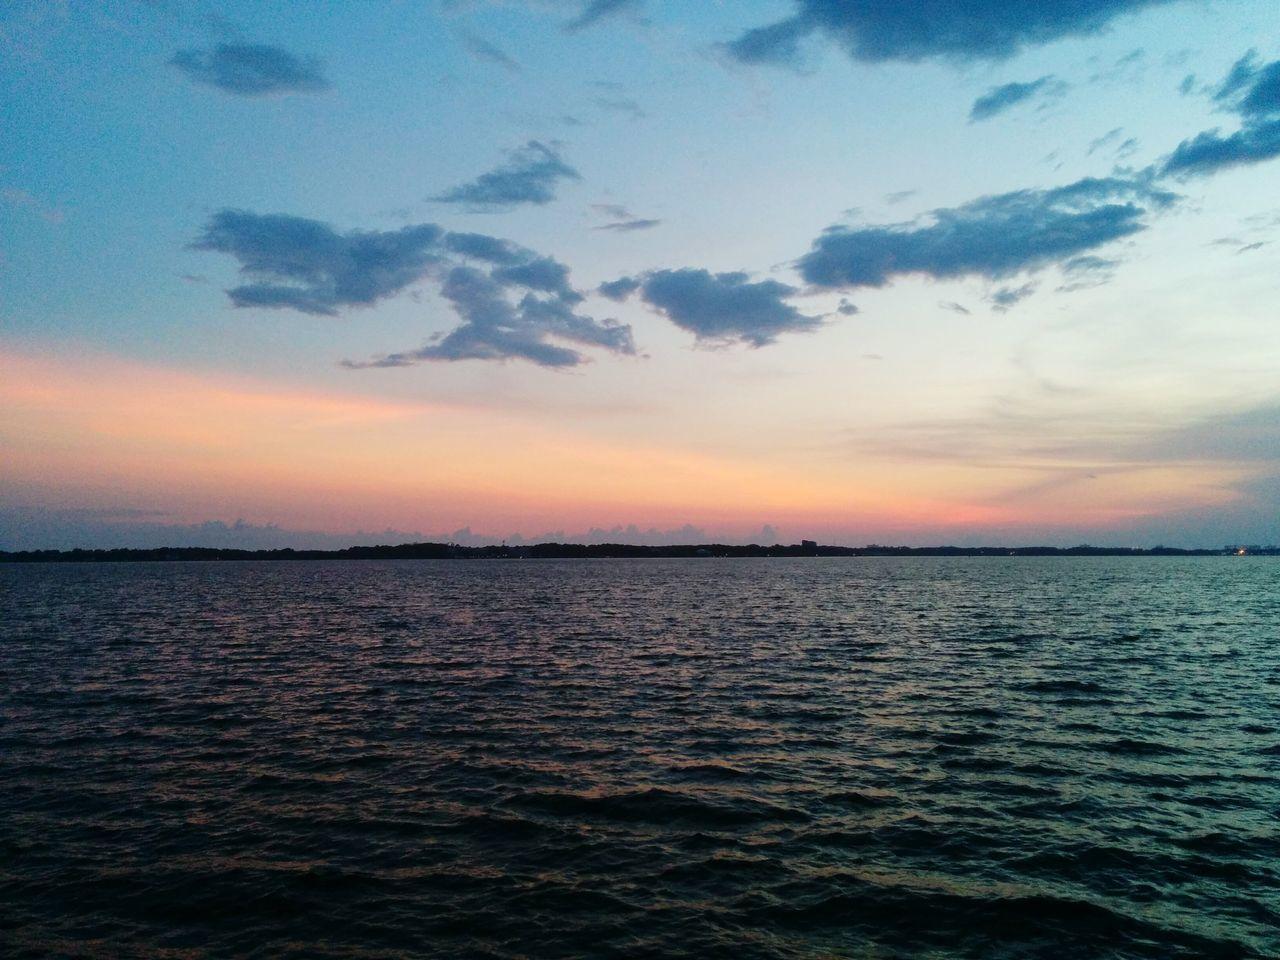 Panama City sunset Panama City Bay Fresh Air Enjoying The Sunset Sunset Last Night